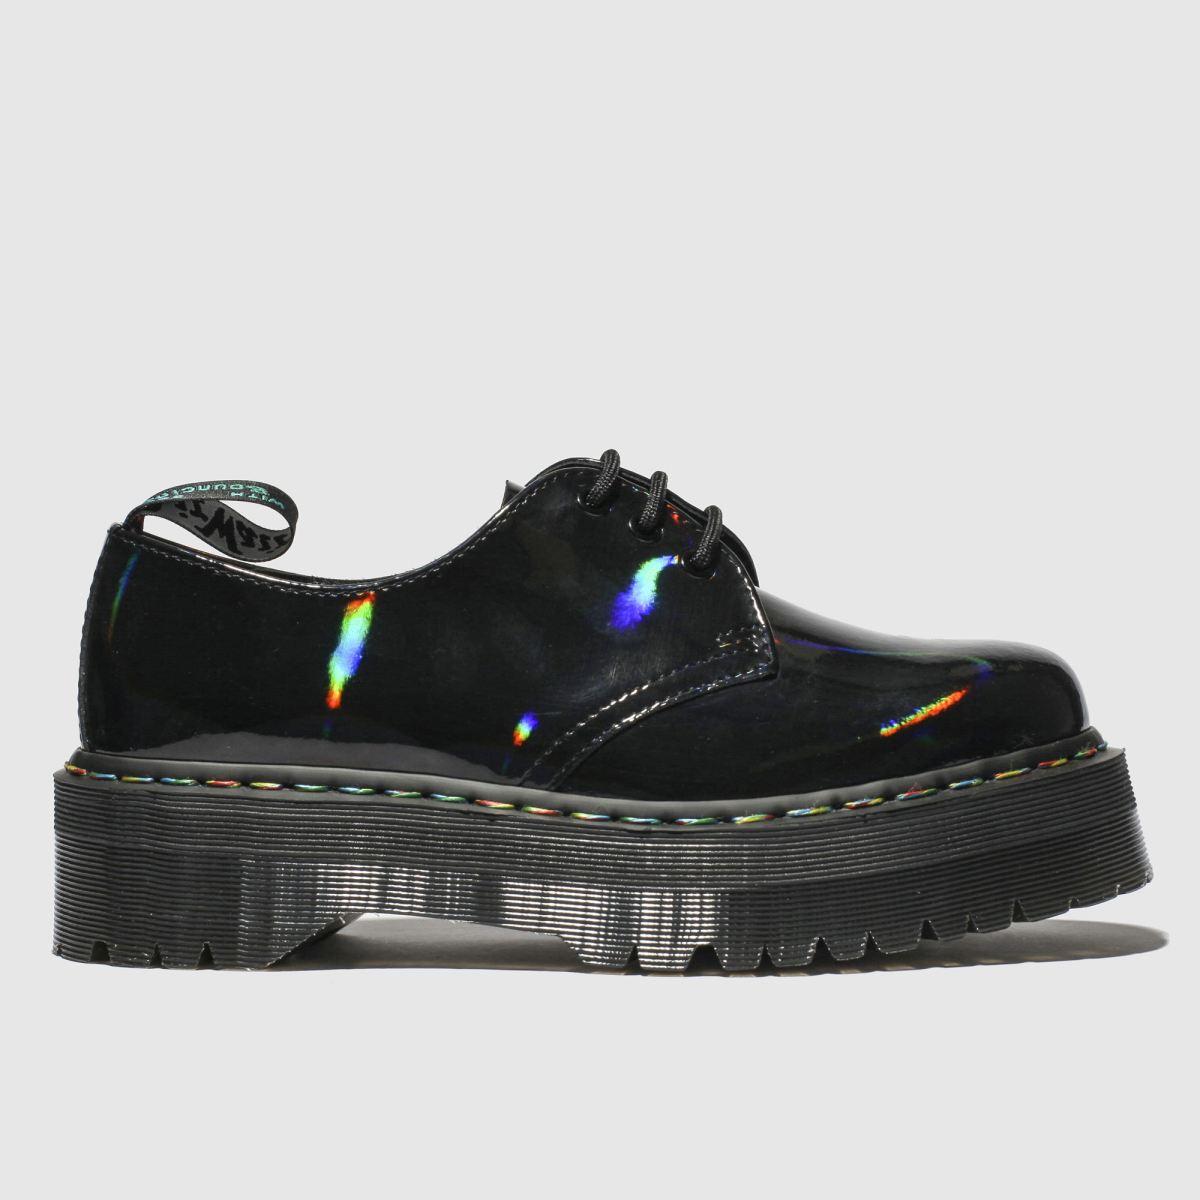 Dr Martens Black 1461 Molly Rainbow Flat Shoes